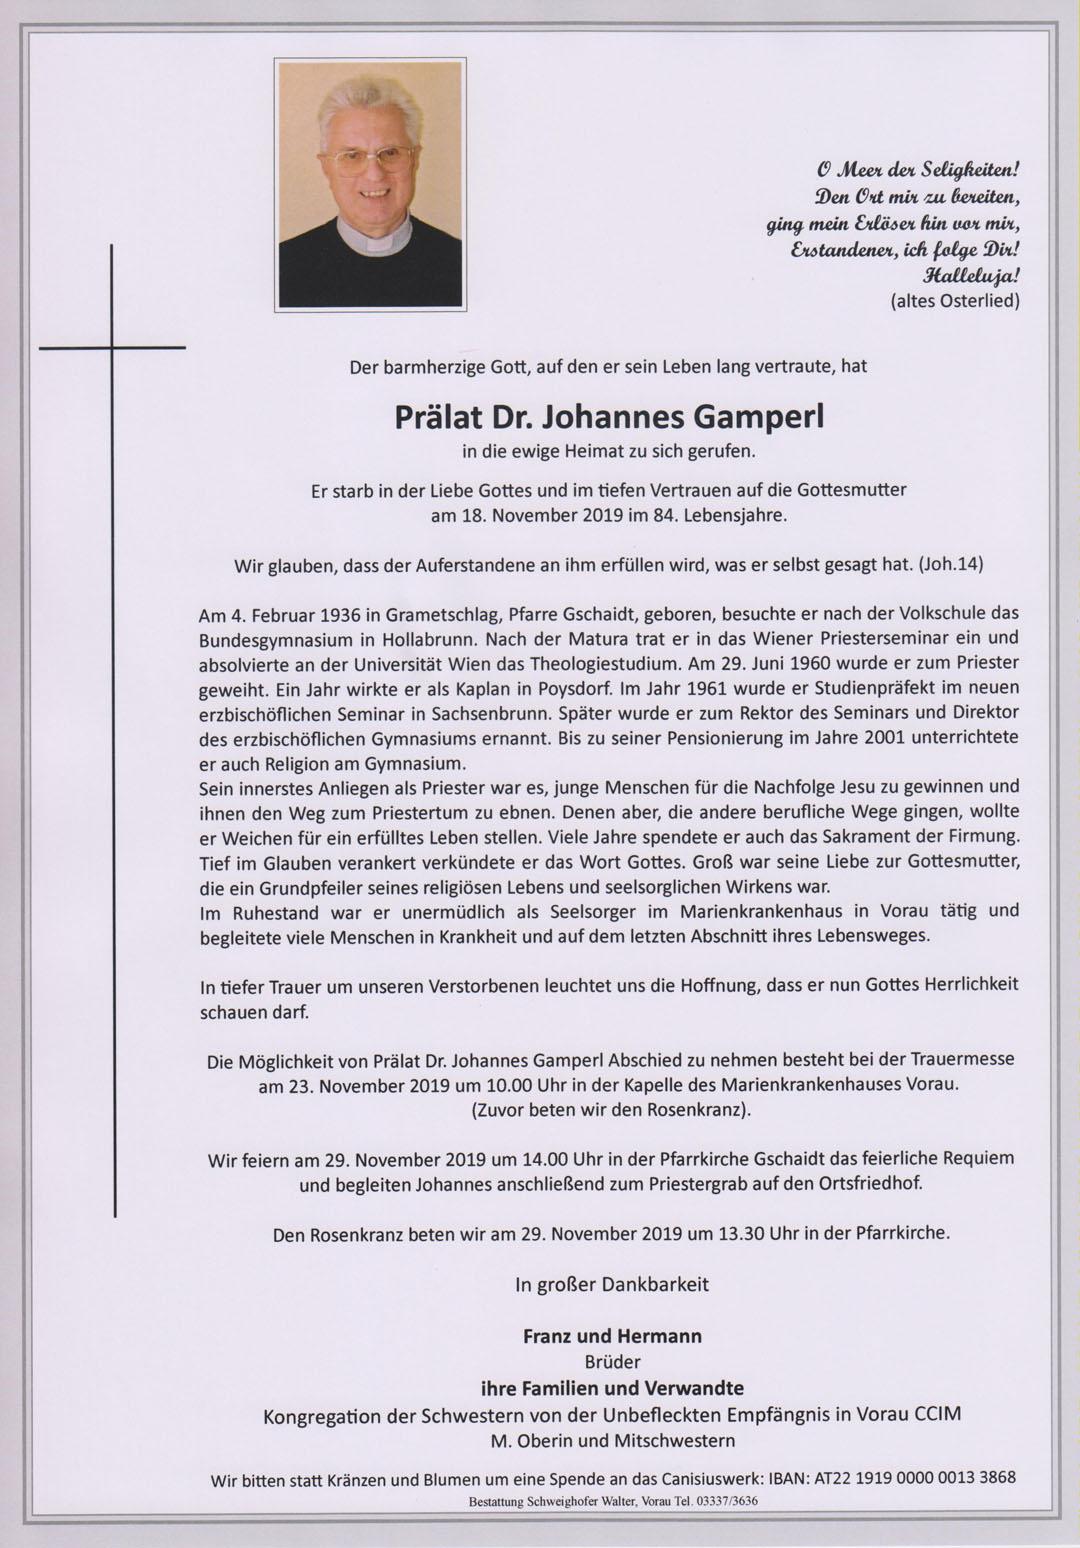 Prälat Dr. Johannes Gamperl